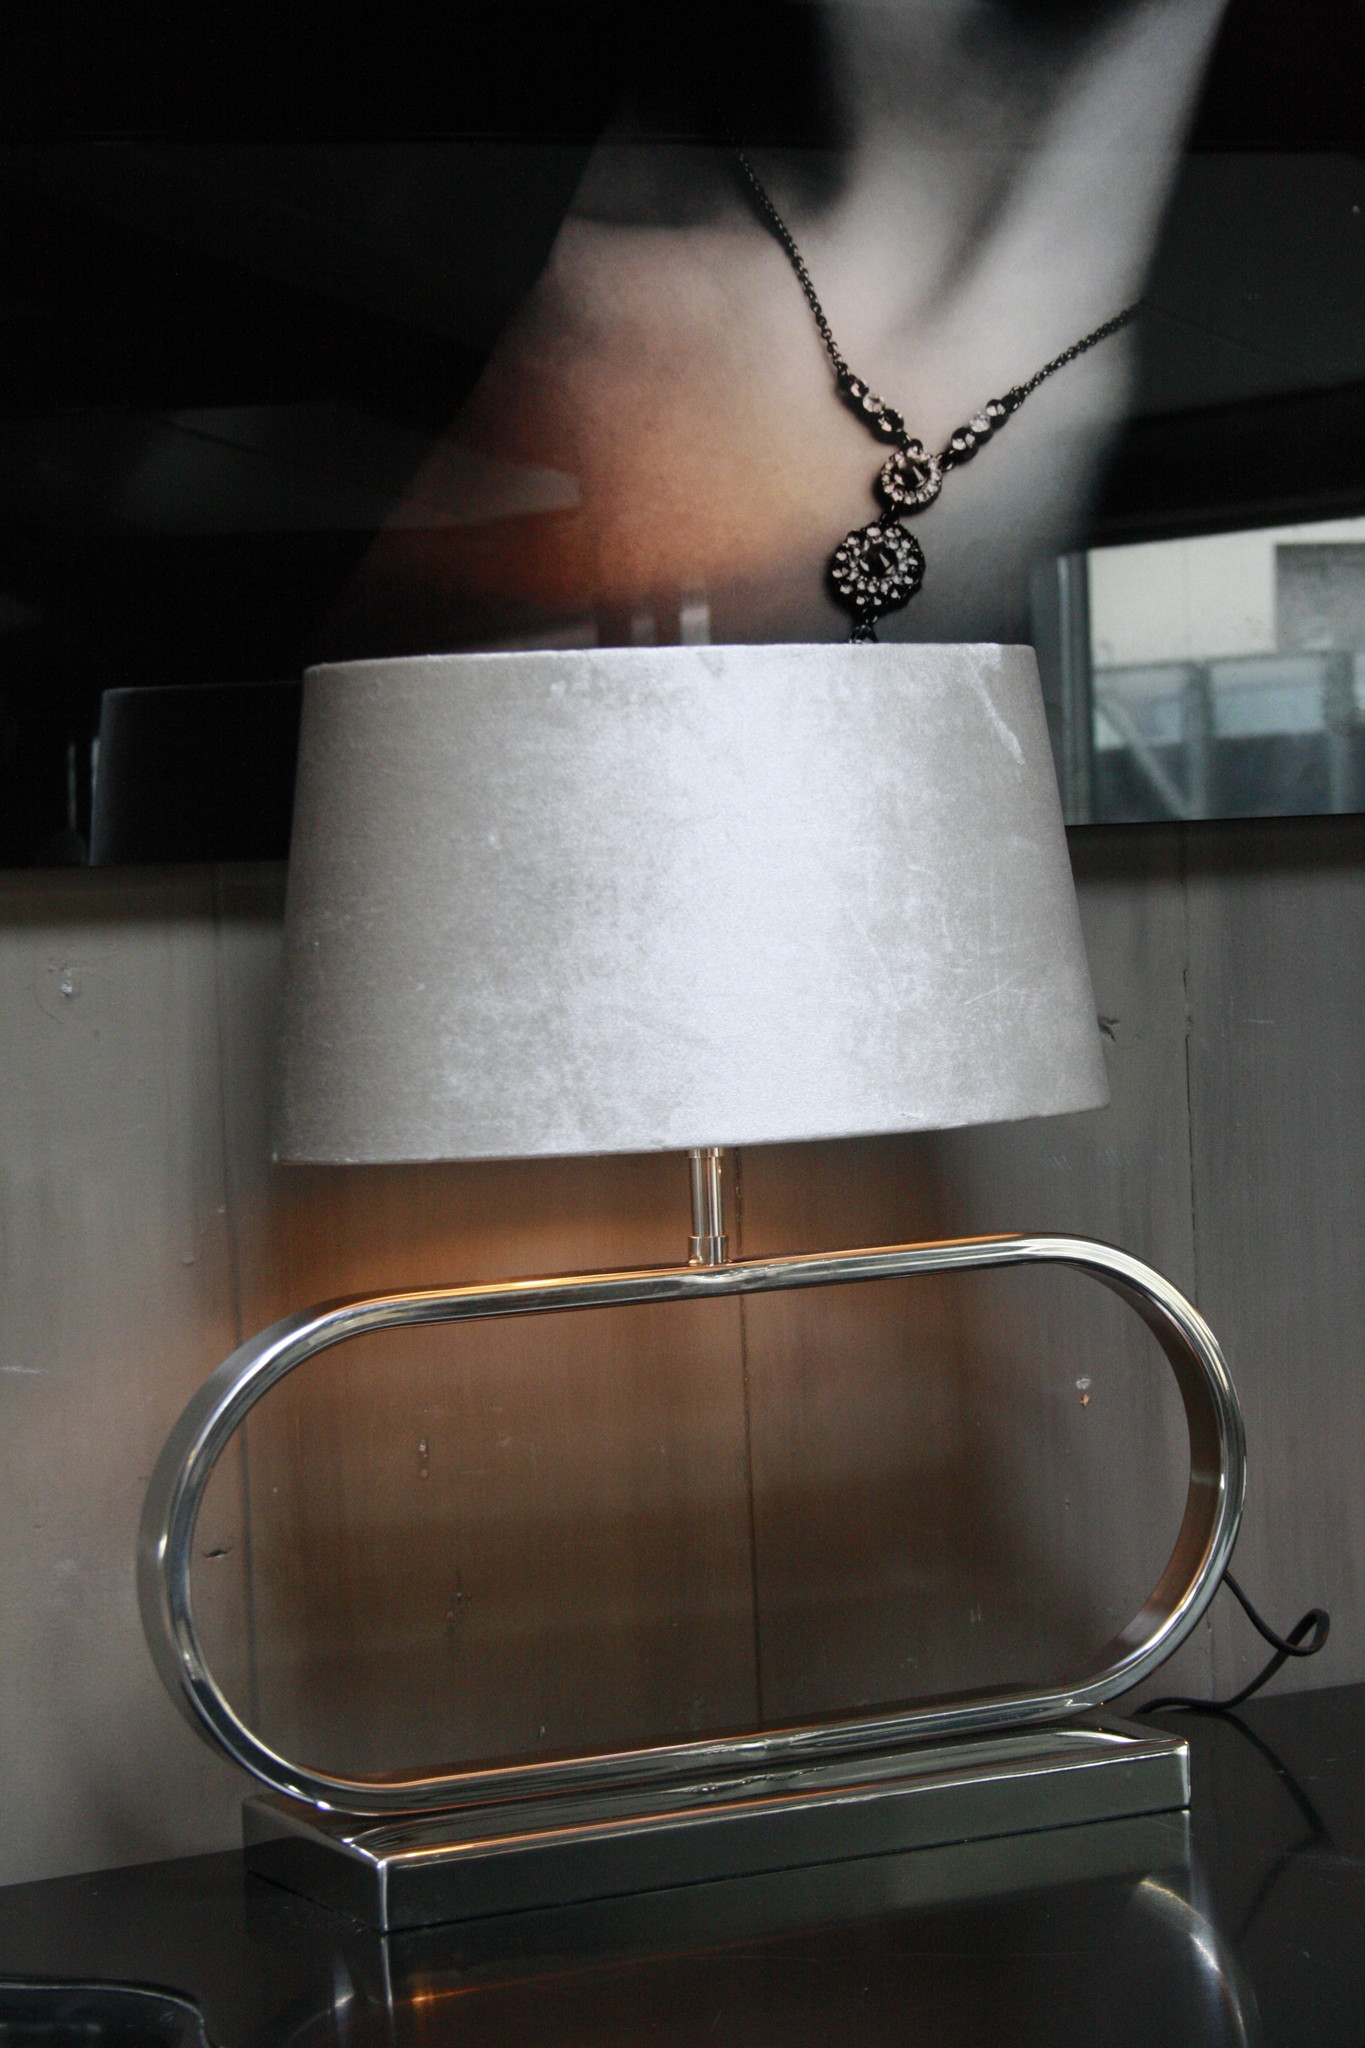 Tafellamp Ovaal RVS + Velours kap Eric Kuster Stijl-5